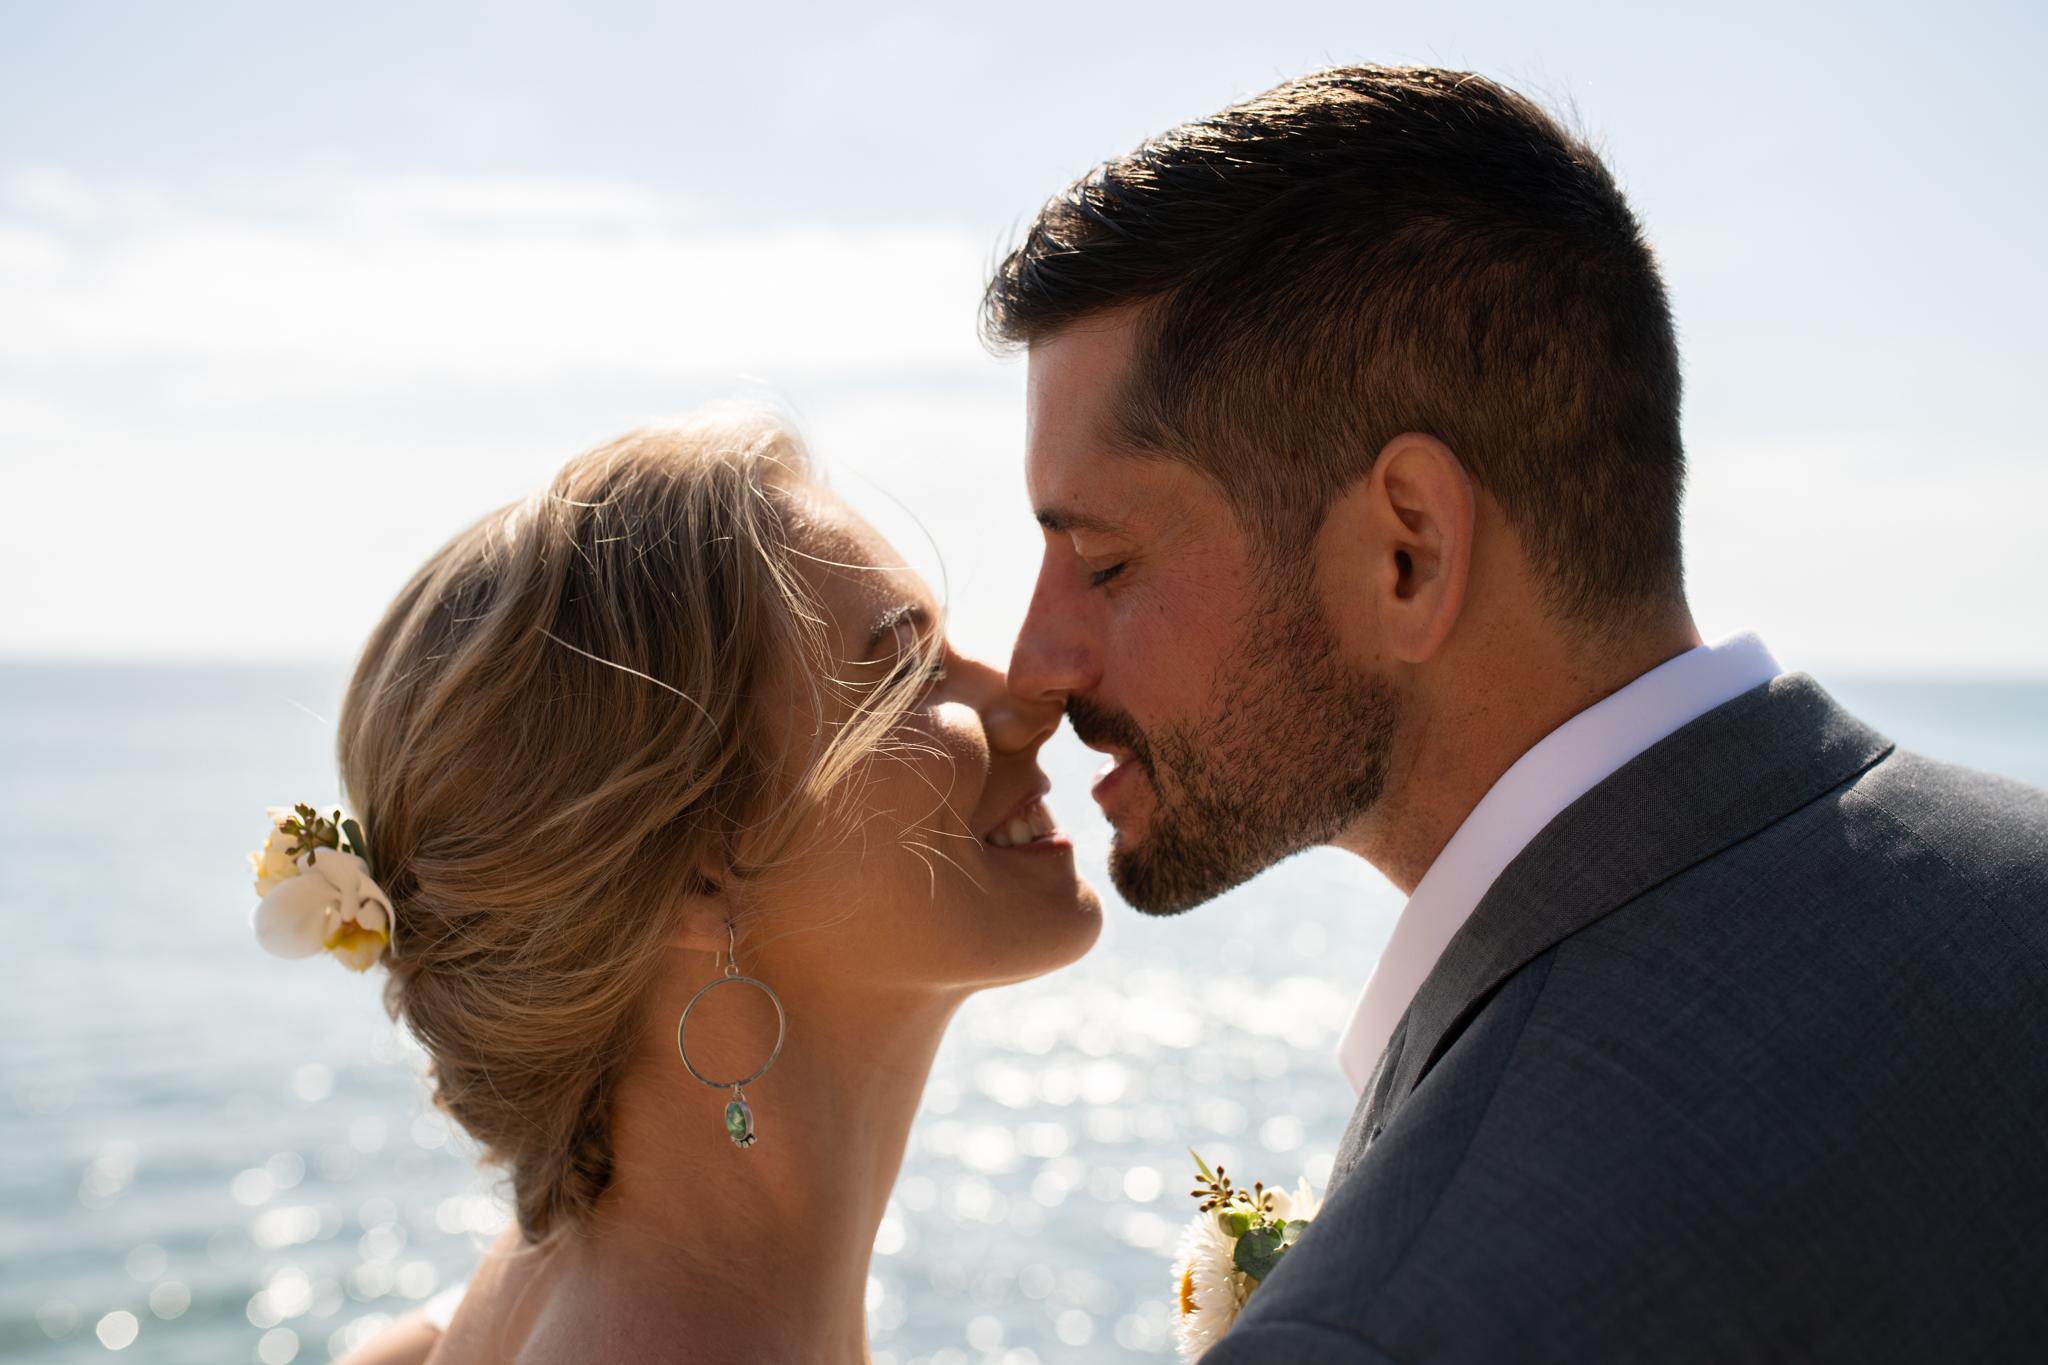 11_PRVW_Jenny_Ken_Wedding_Trevor_Hooper_Photo.jpg